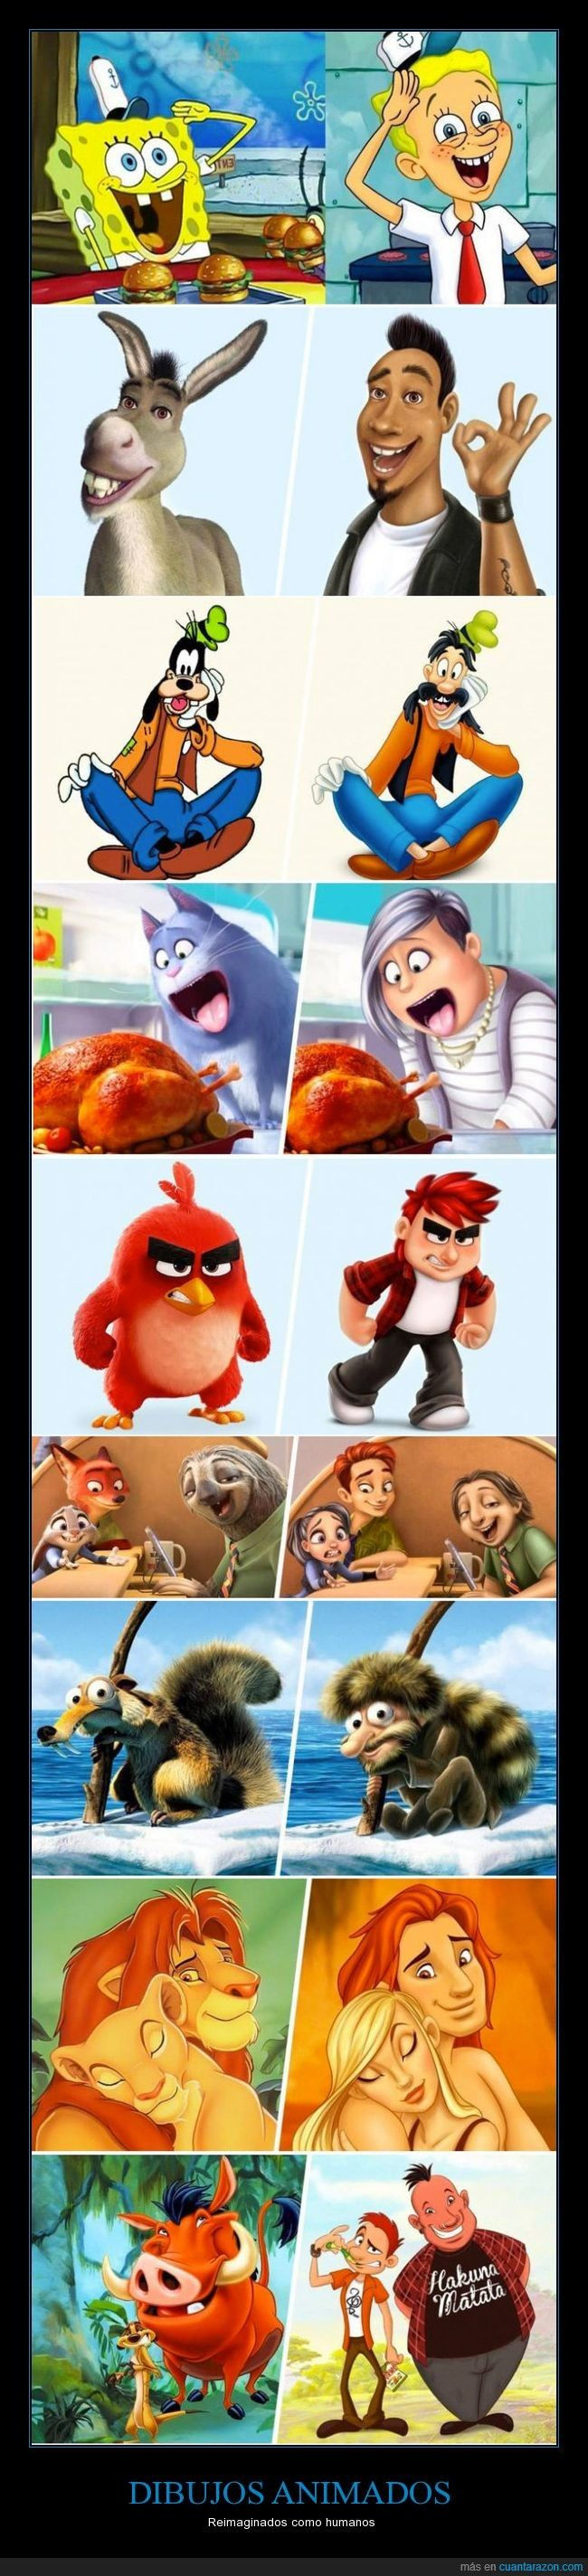 13 caracteres animados reimaginados como humanos